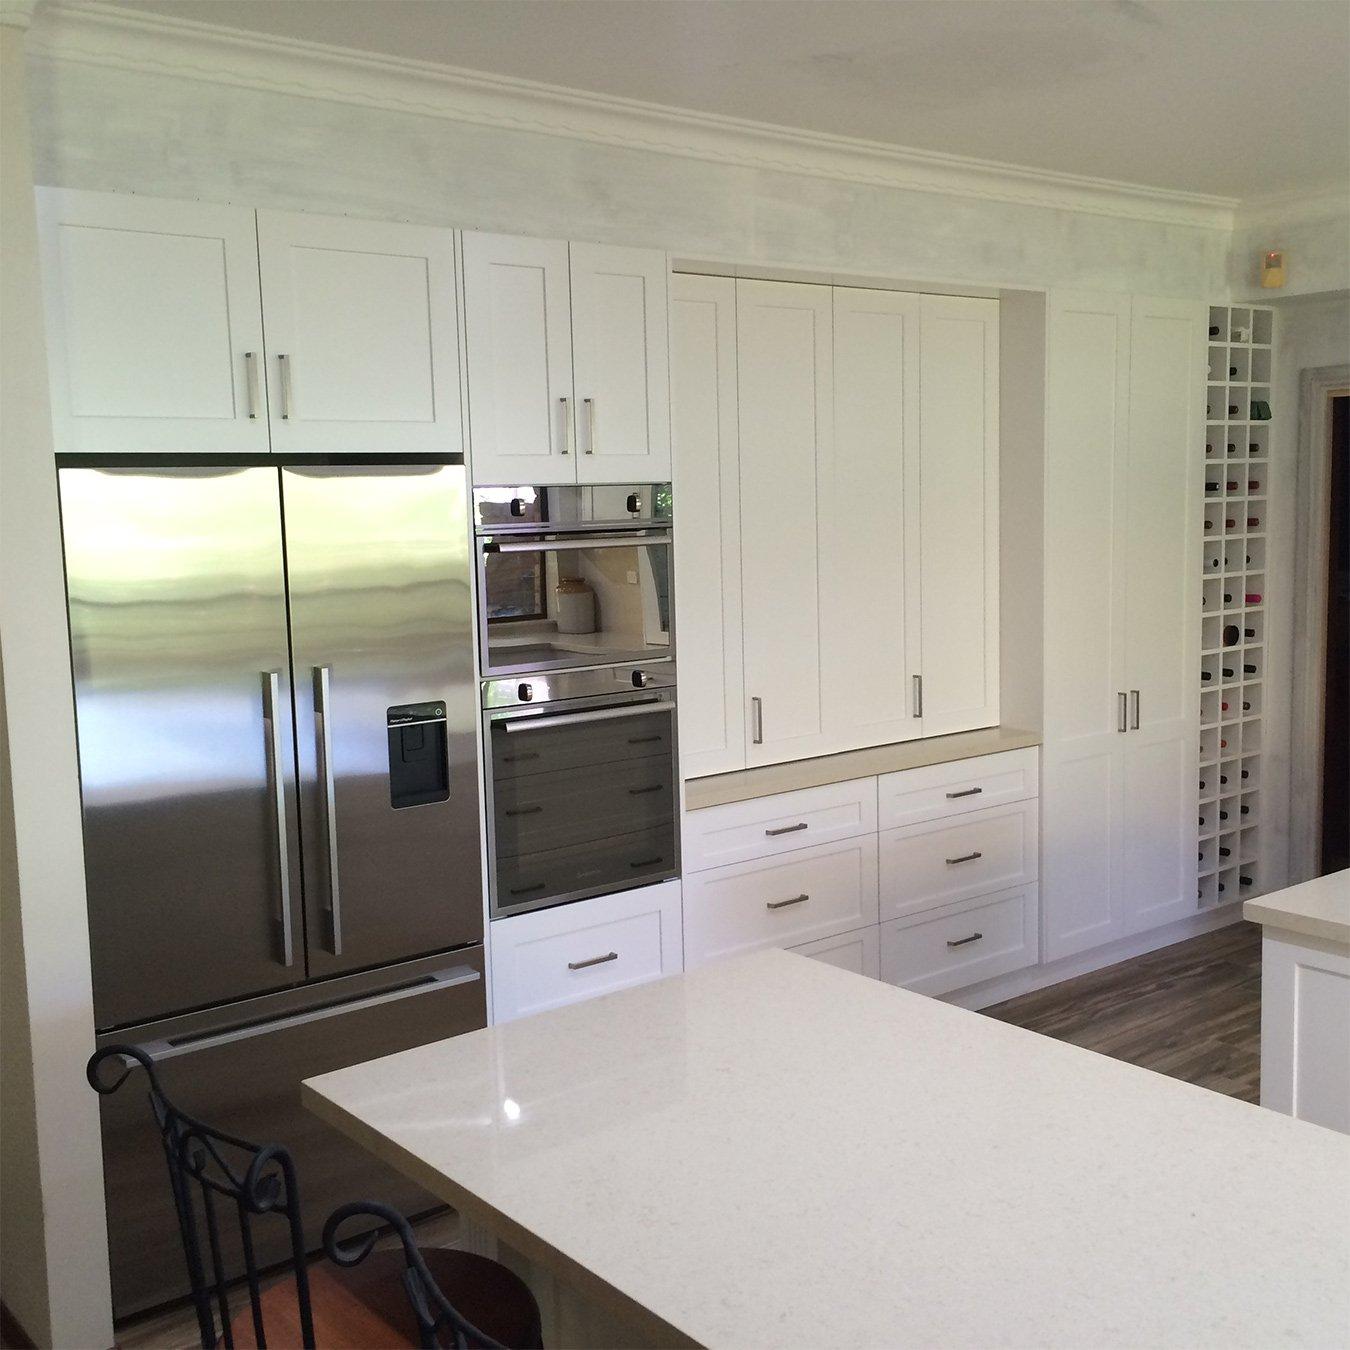 New Kitchen Design Experts In Katoomba, NSW